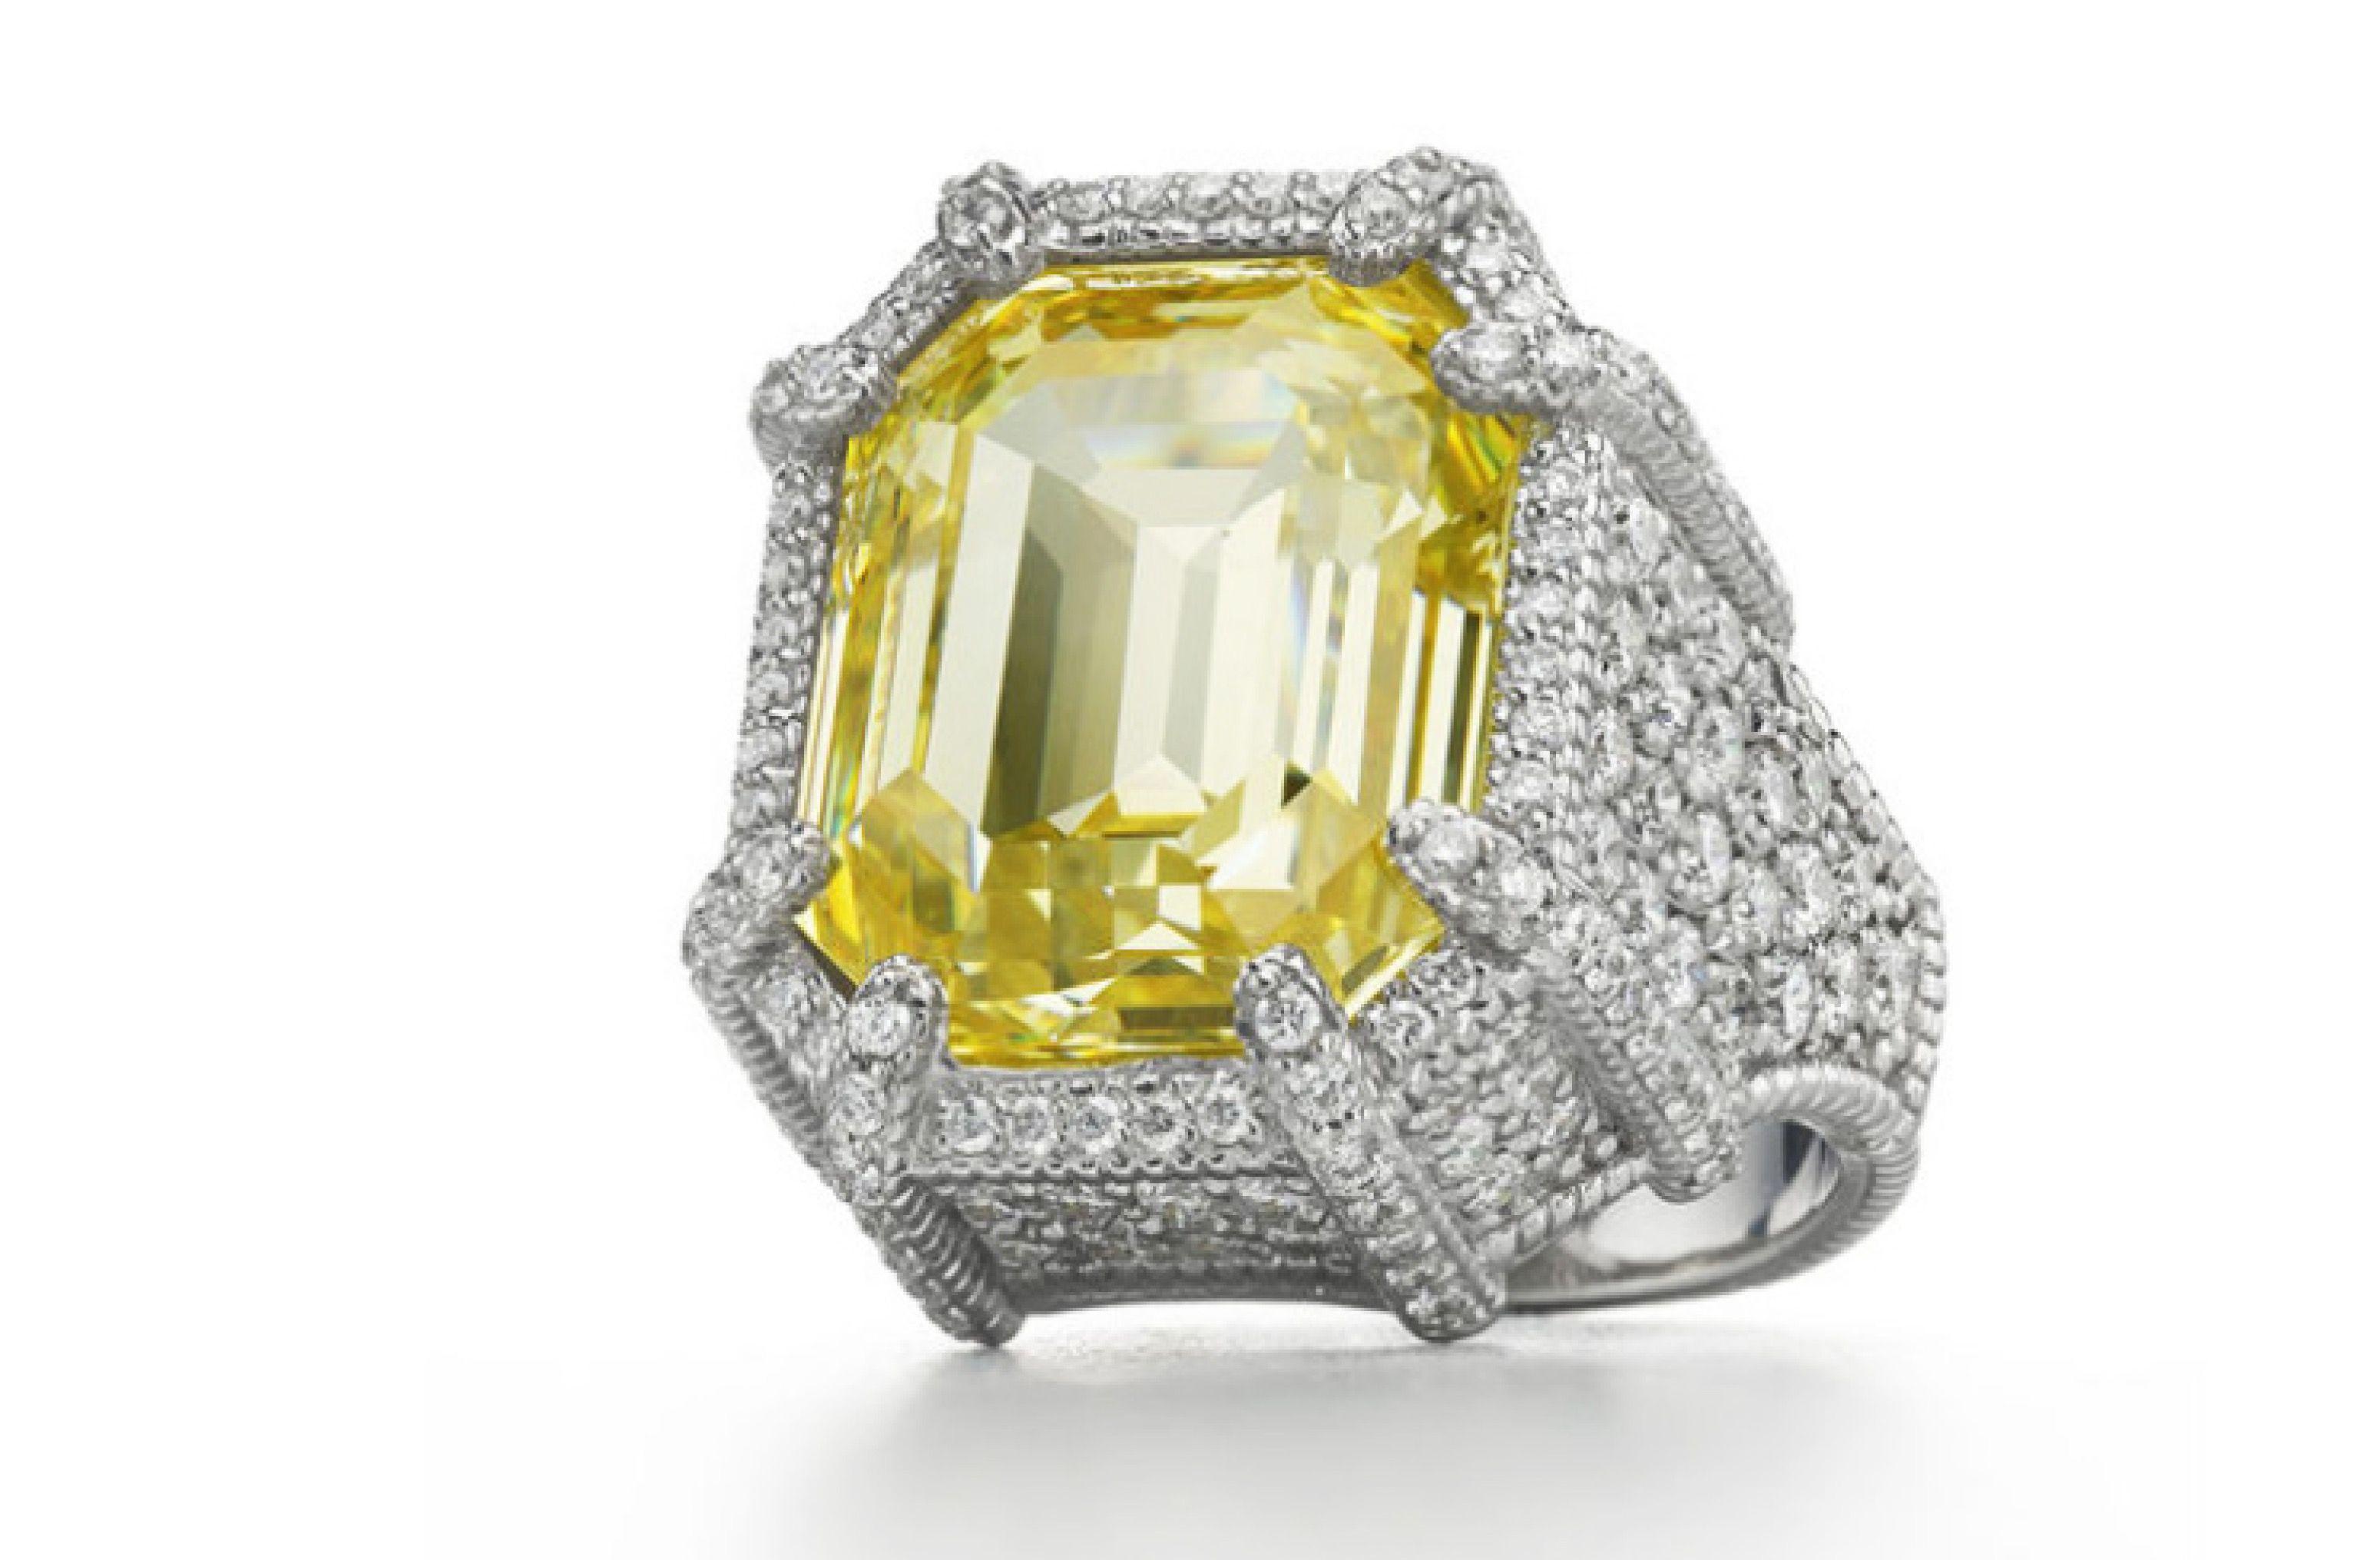 JewelryWhite_24.jpg